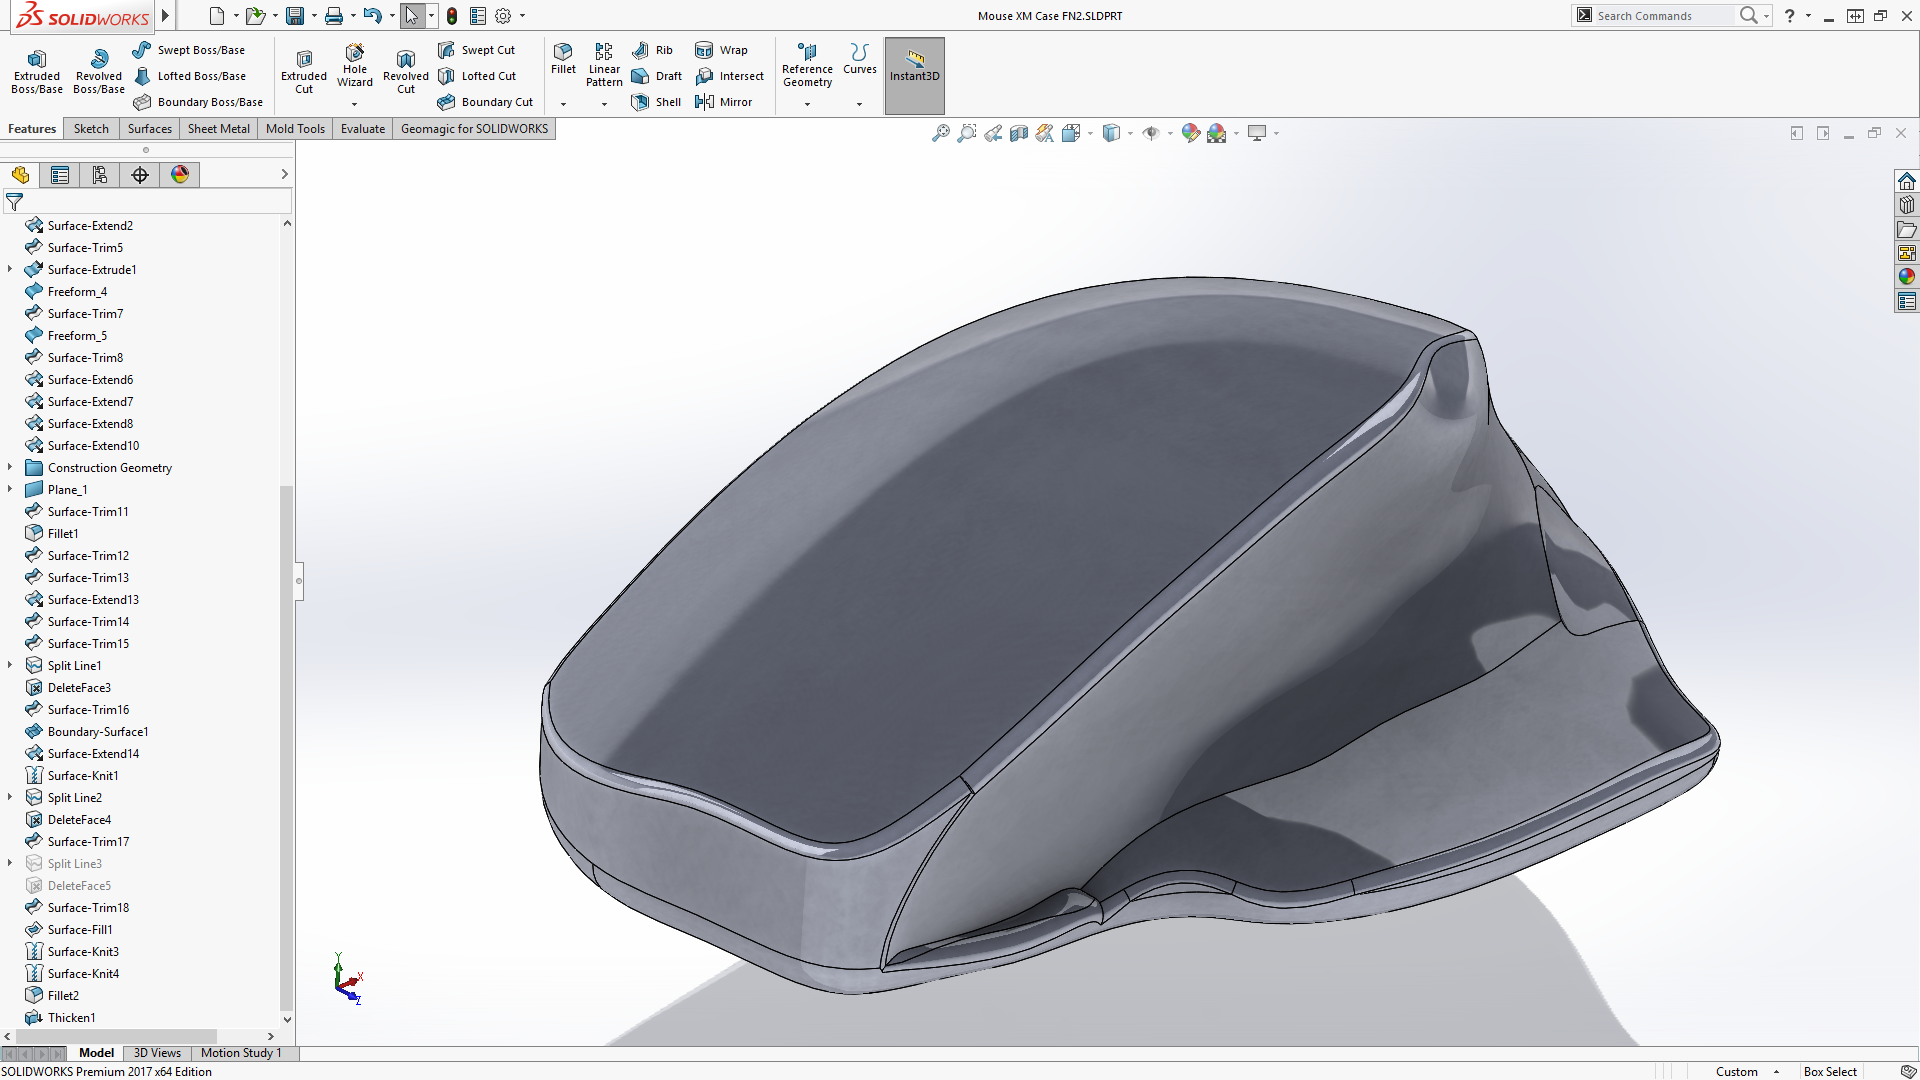 Custom Mouse Case